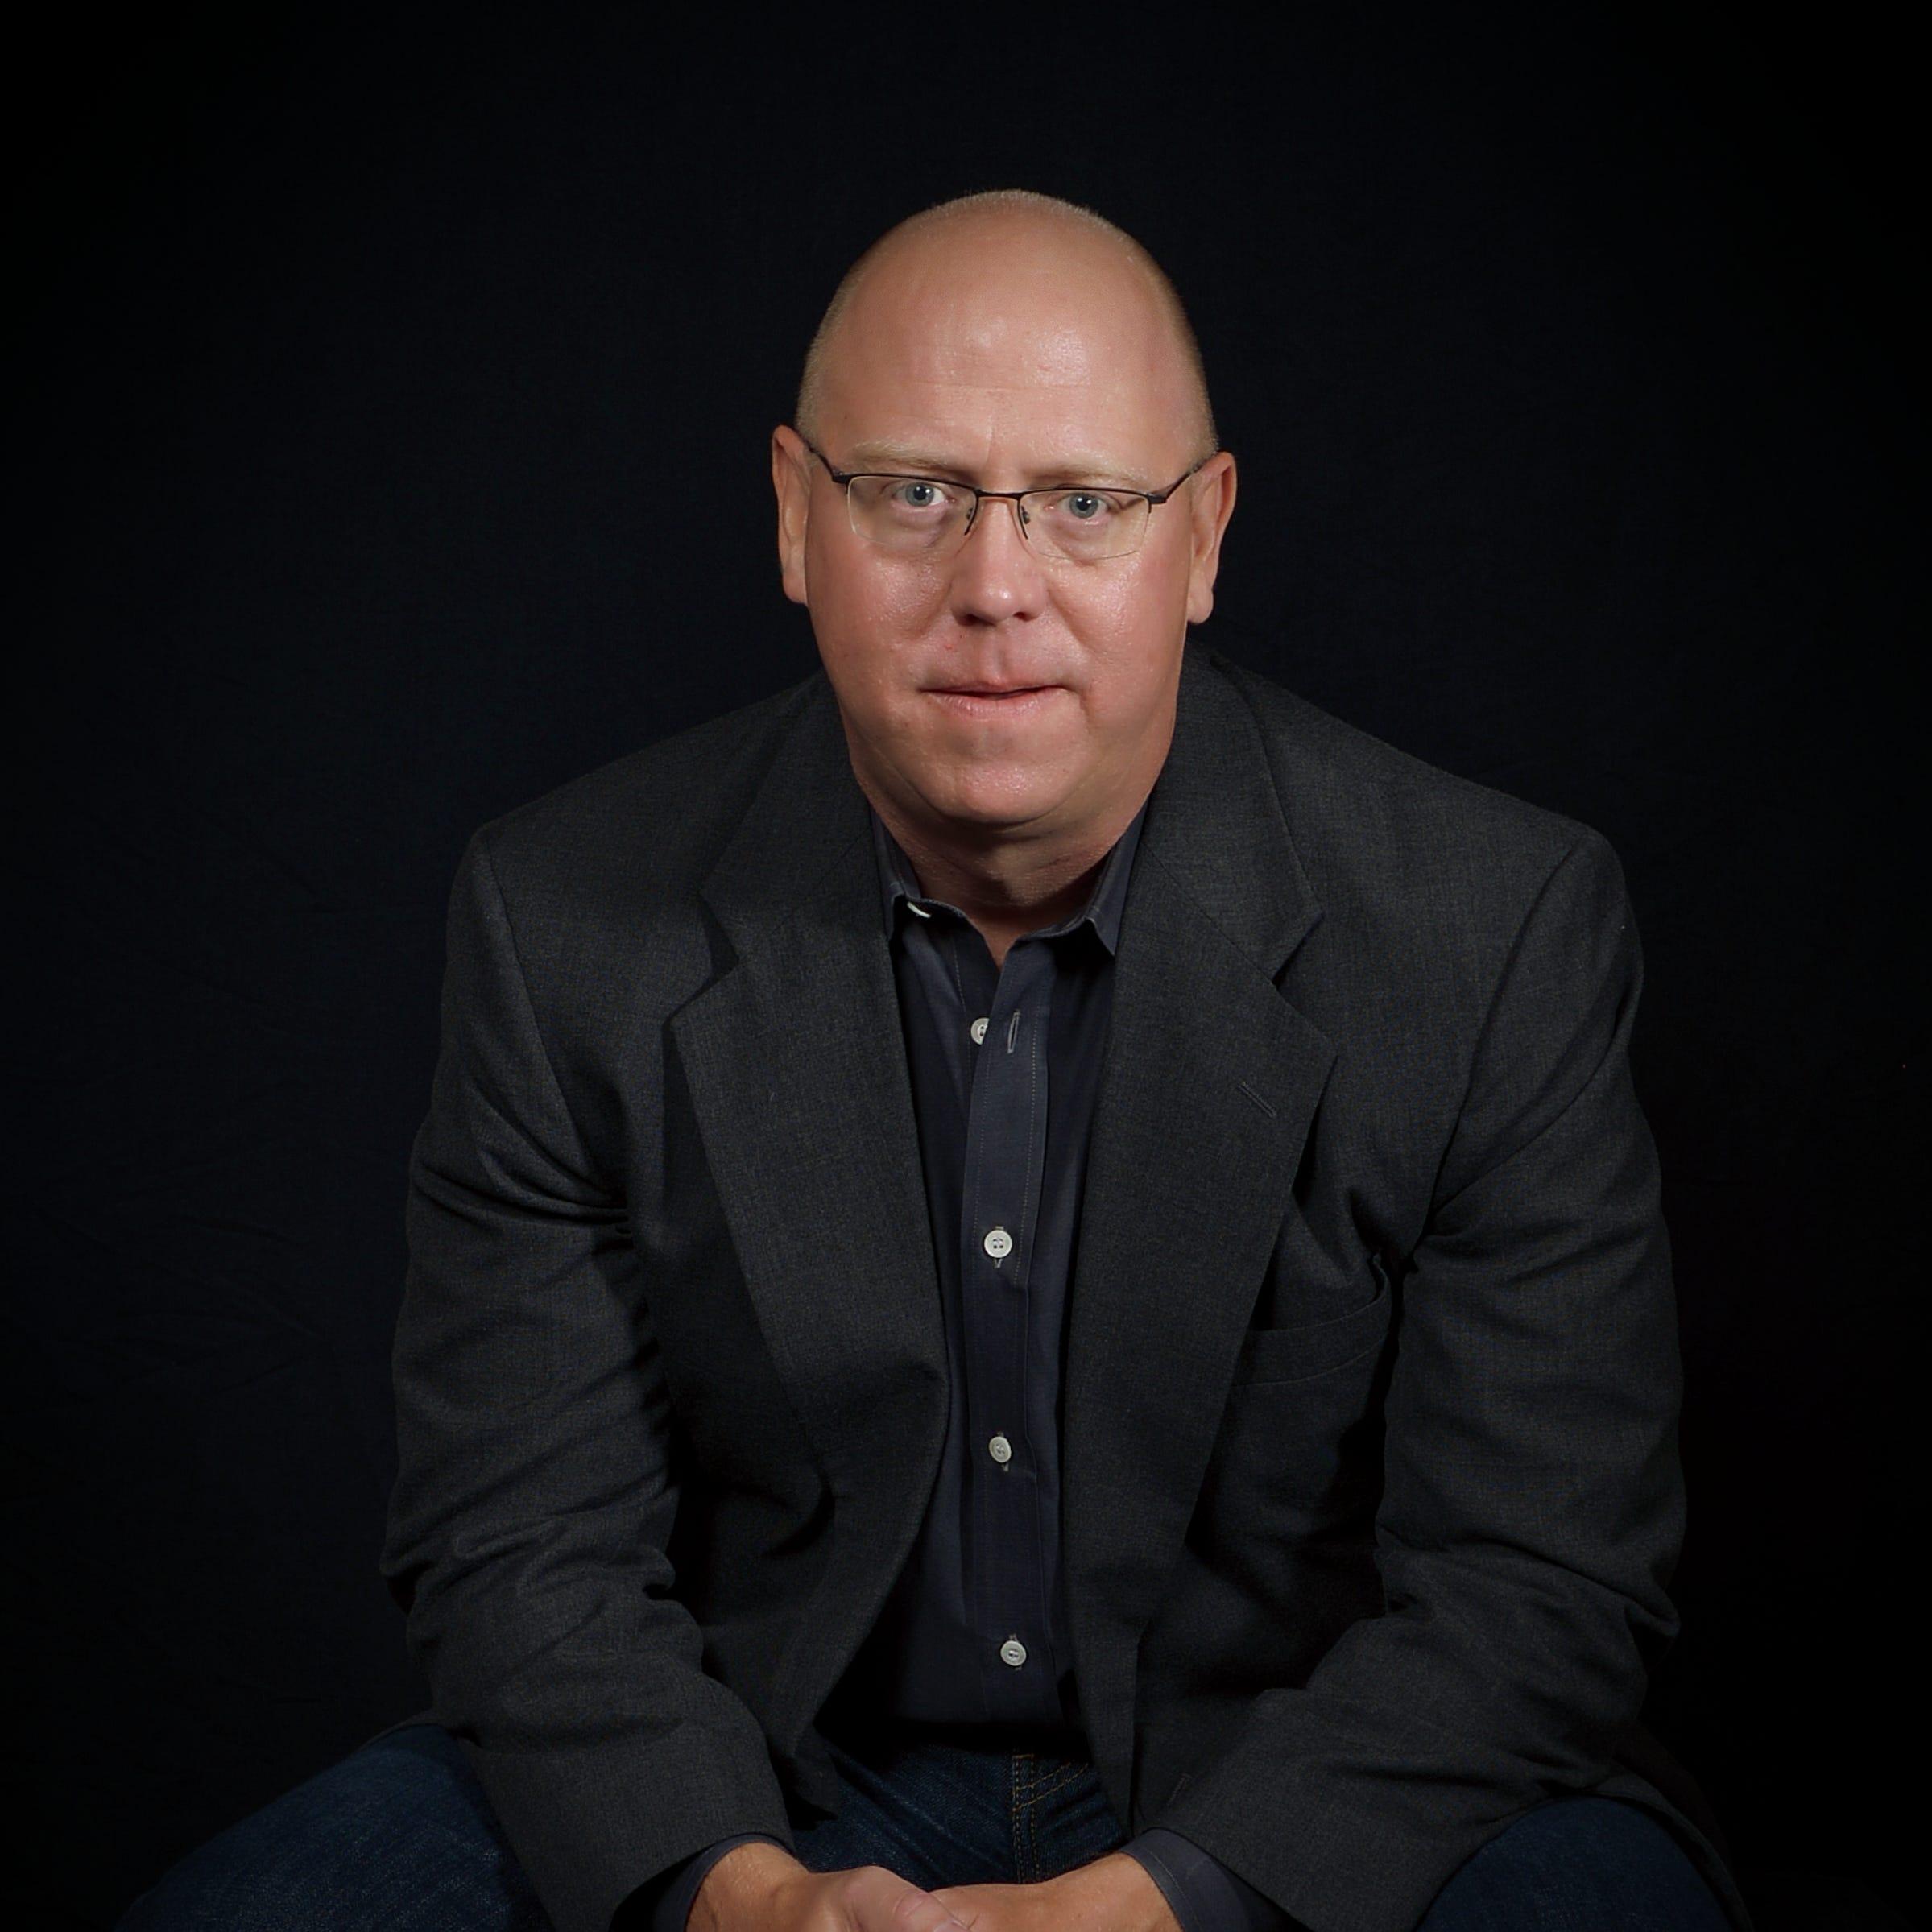 Steve Dieterichs